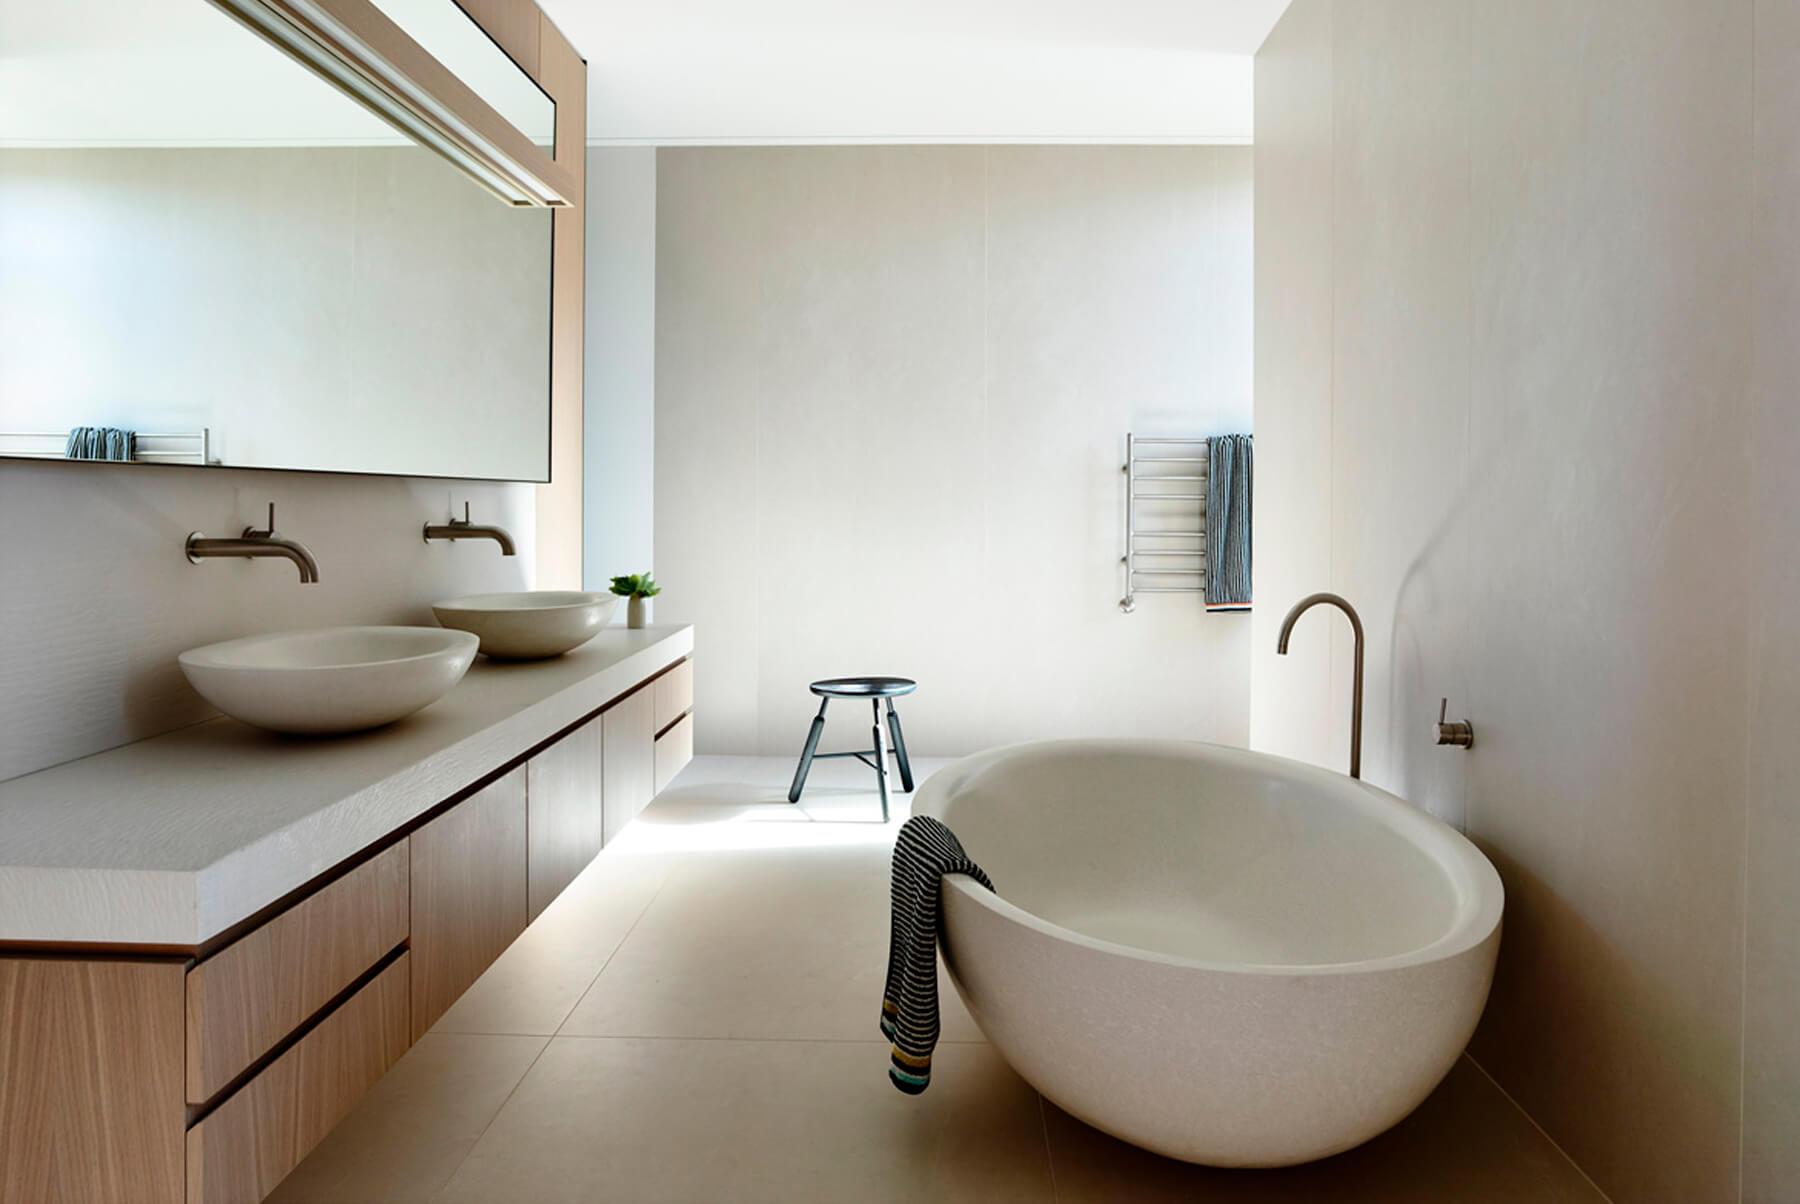 ARTESIAN-Concrete-Bath-inset-1-1800x1204